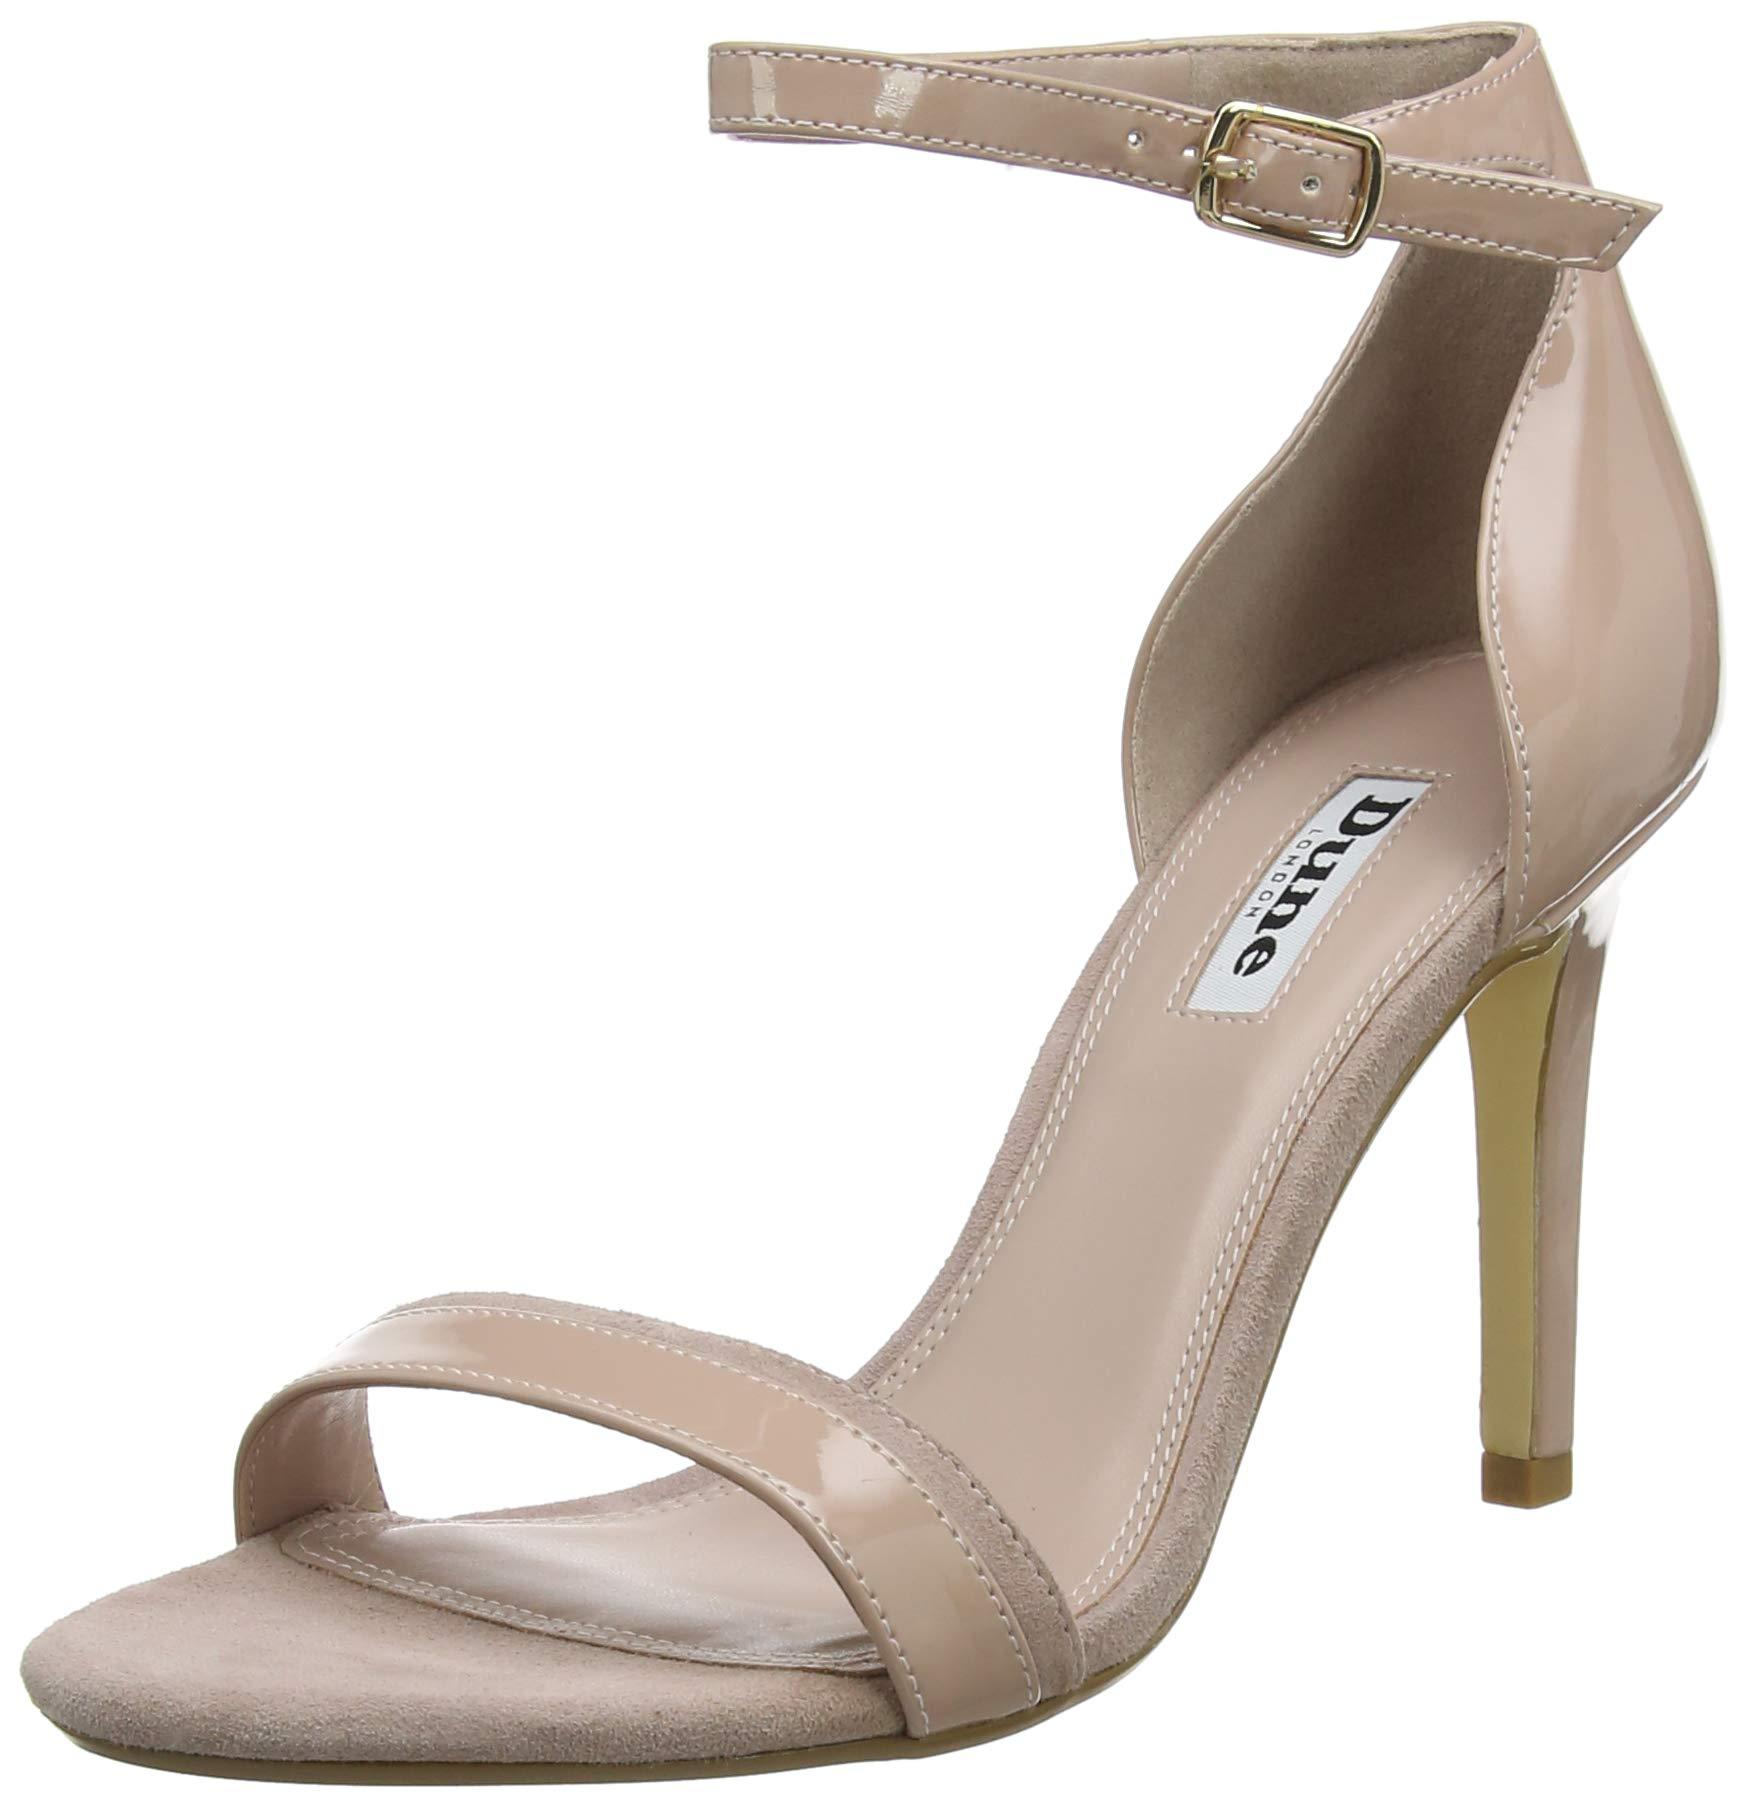 FemmeBeige patent38 Bride Camel Eu Dune MerinoEscarpins Cheville 0wvn8Nm